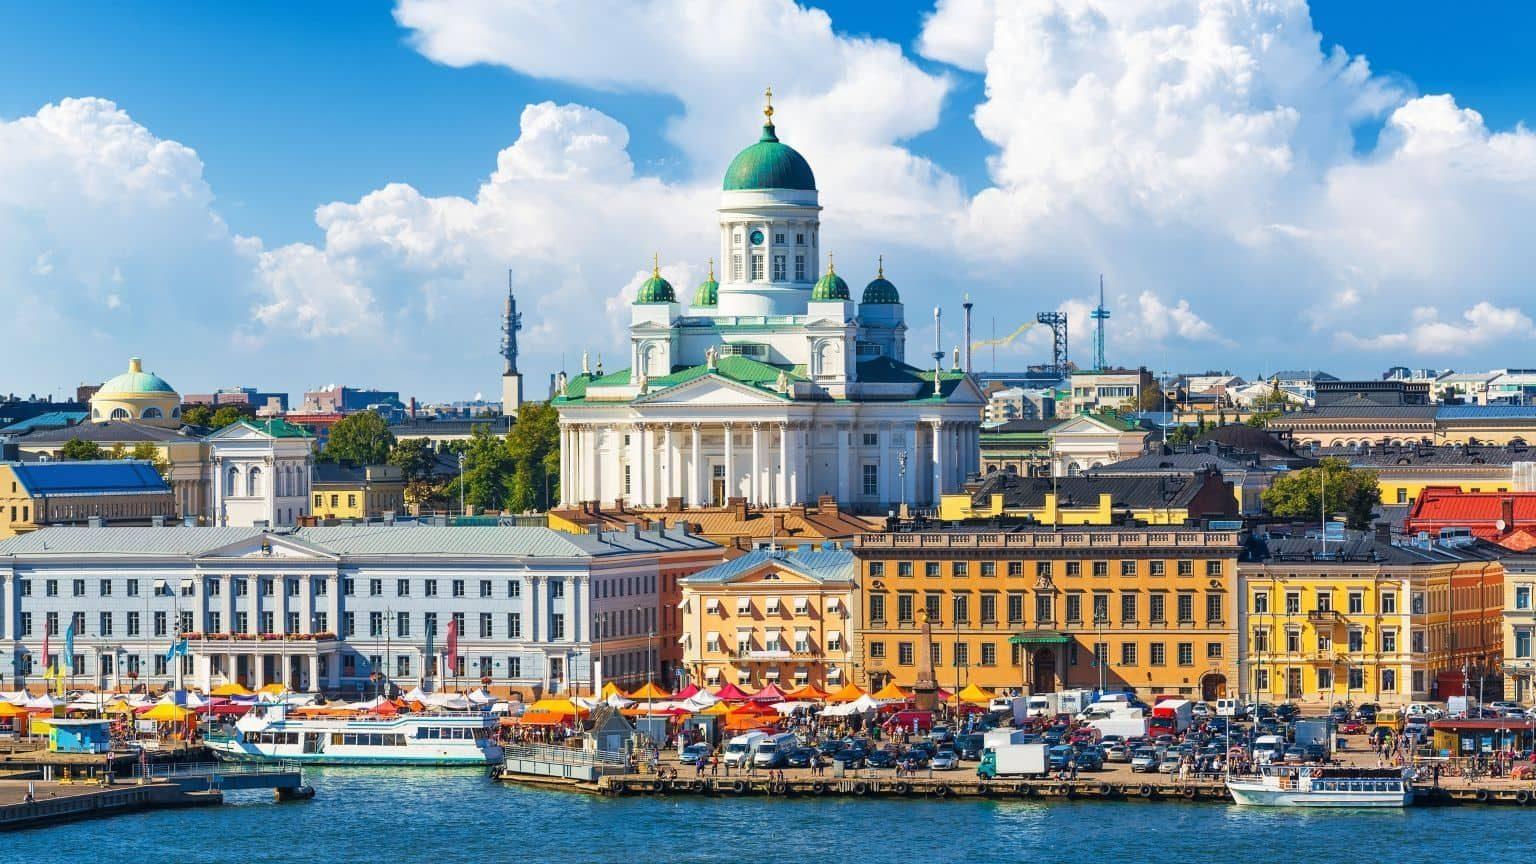 Market Square, Helsinki, Finland